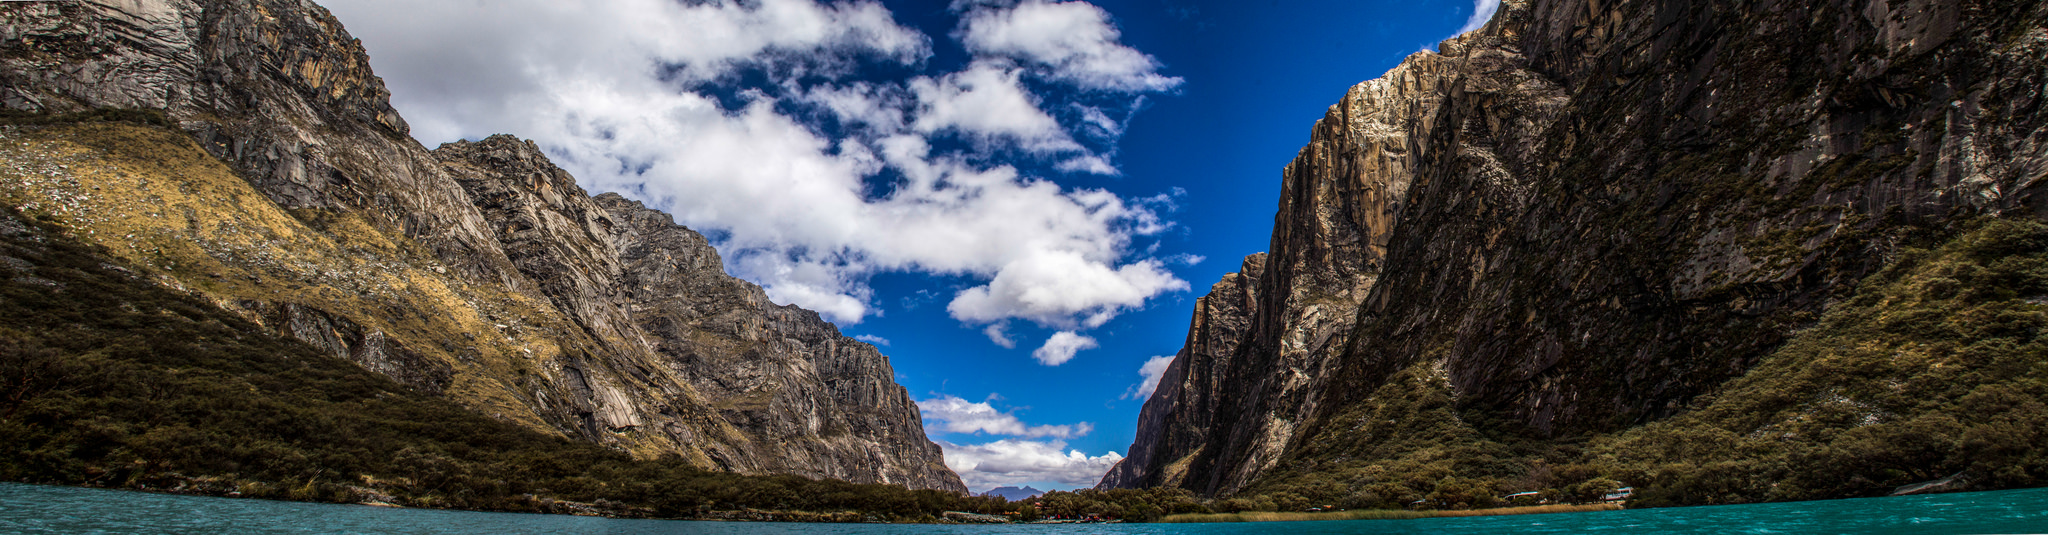 Lago de Huaraz